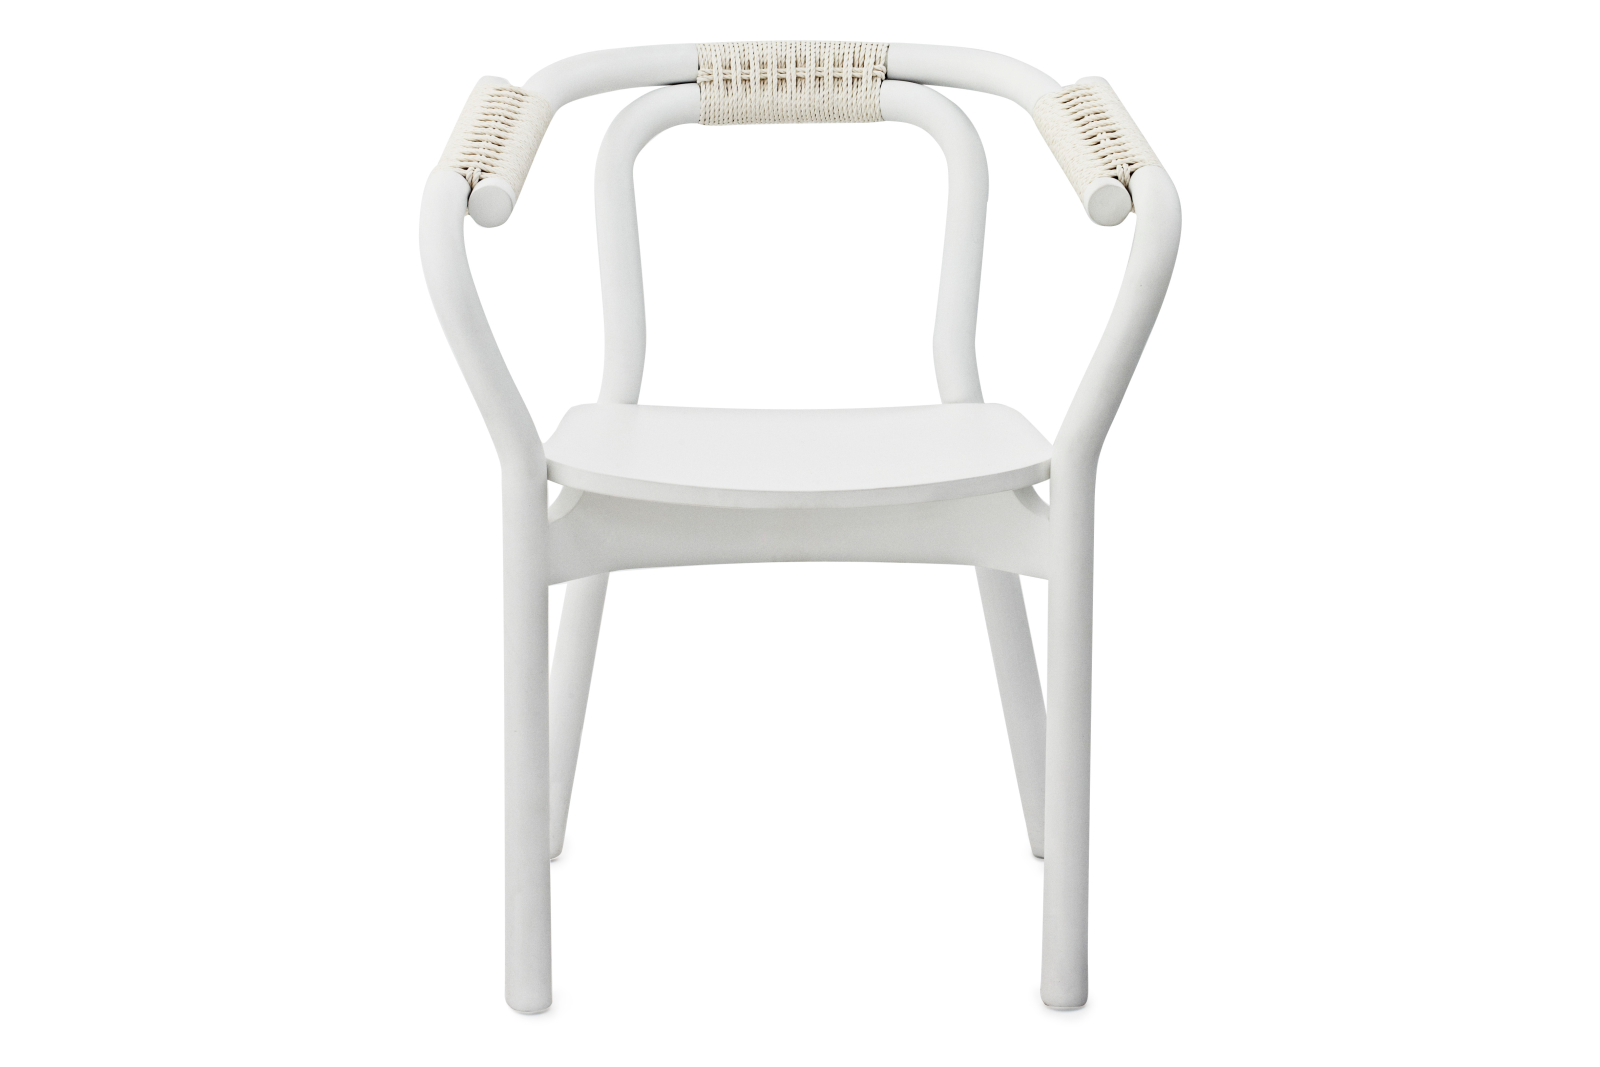 Knot Chair White/White